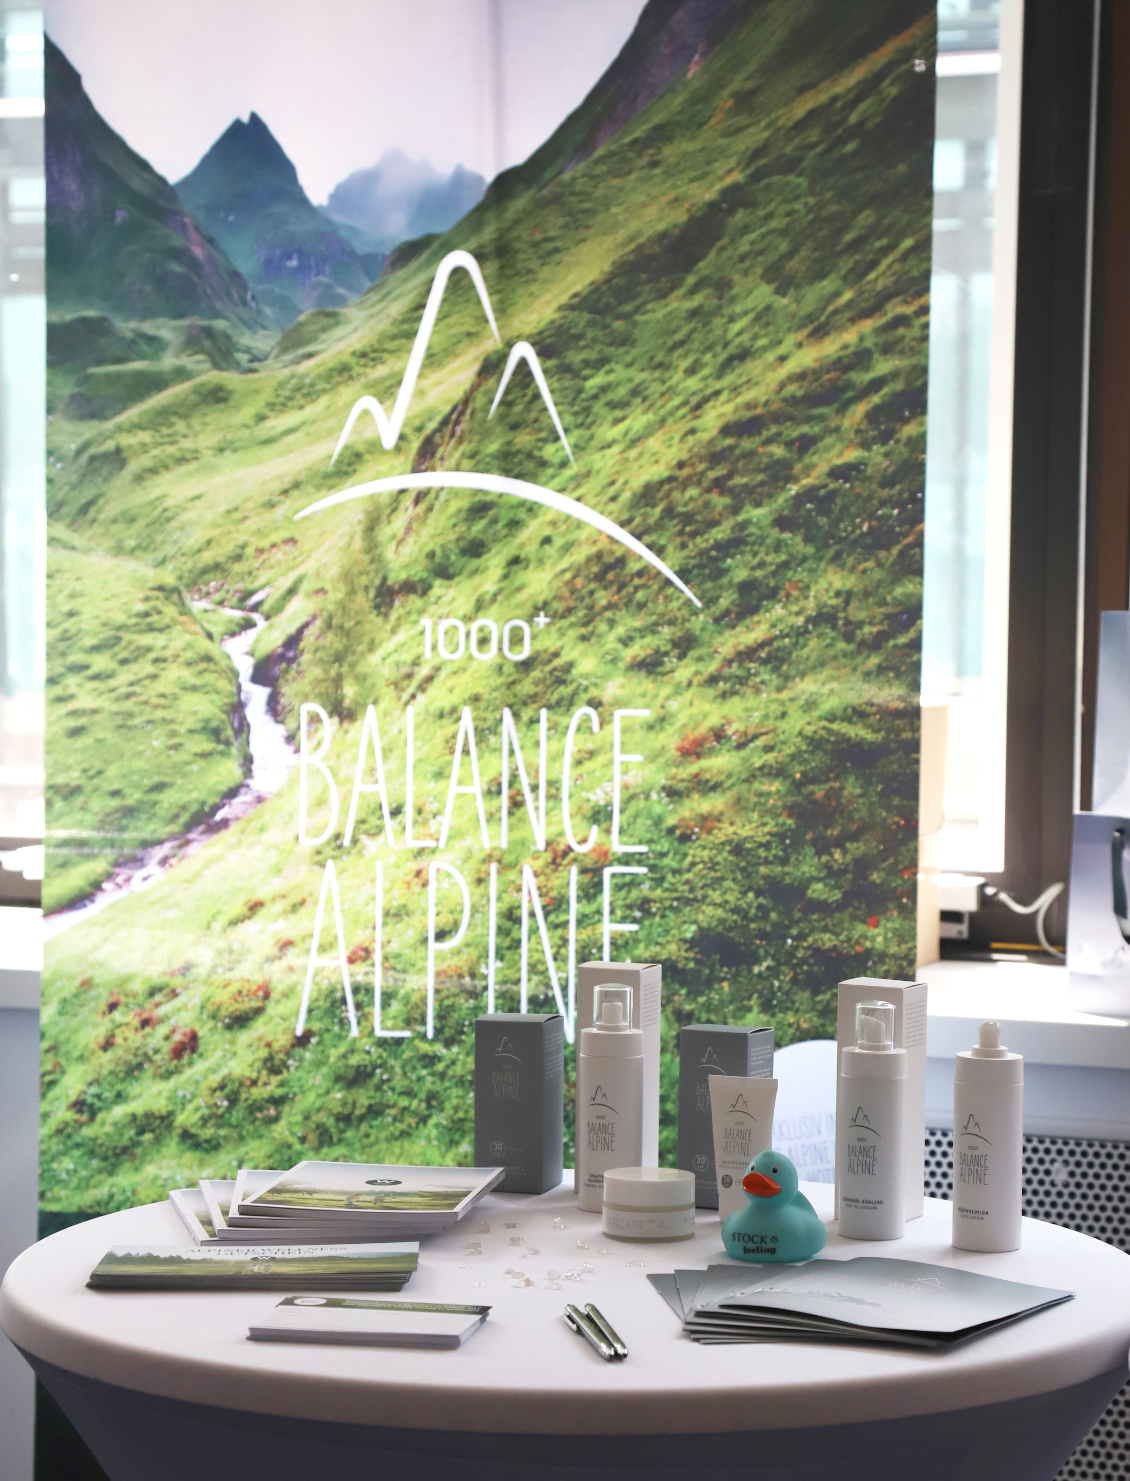 beautypress Blogger Event Mai 2019 Frankfurt Eventbericht - Balance Alpine 1000+